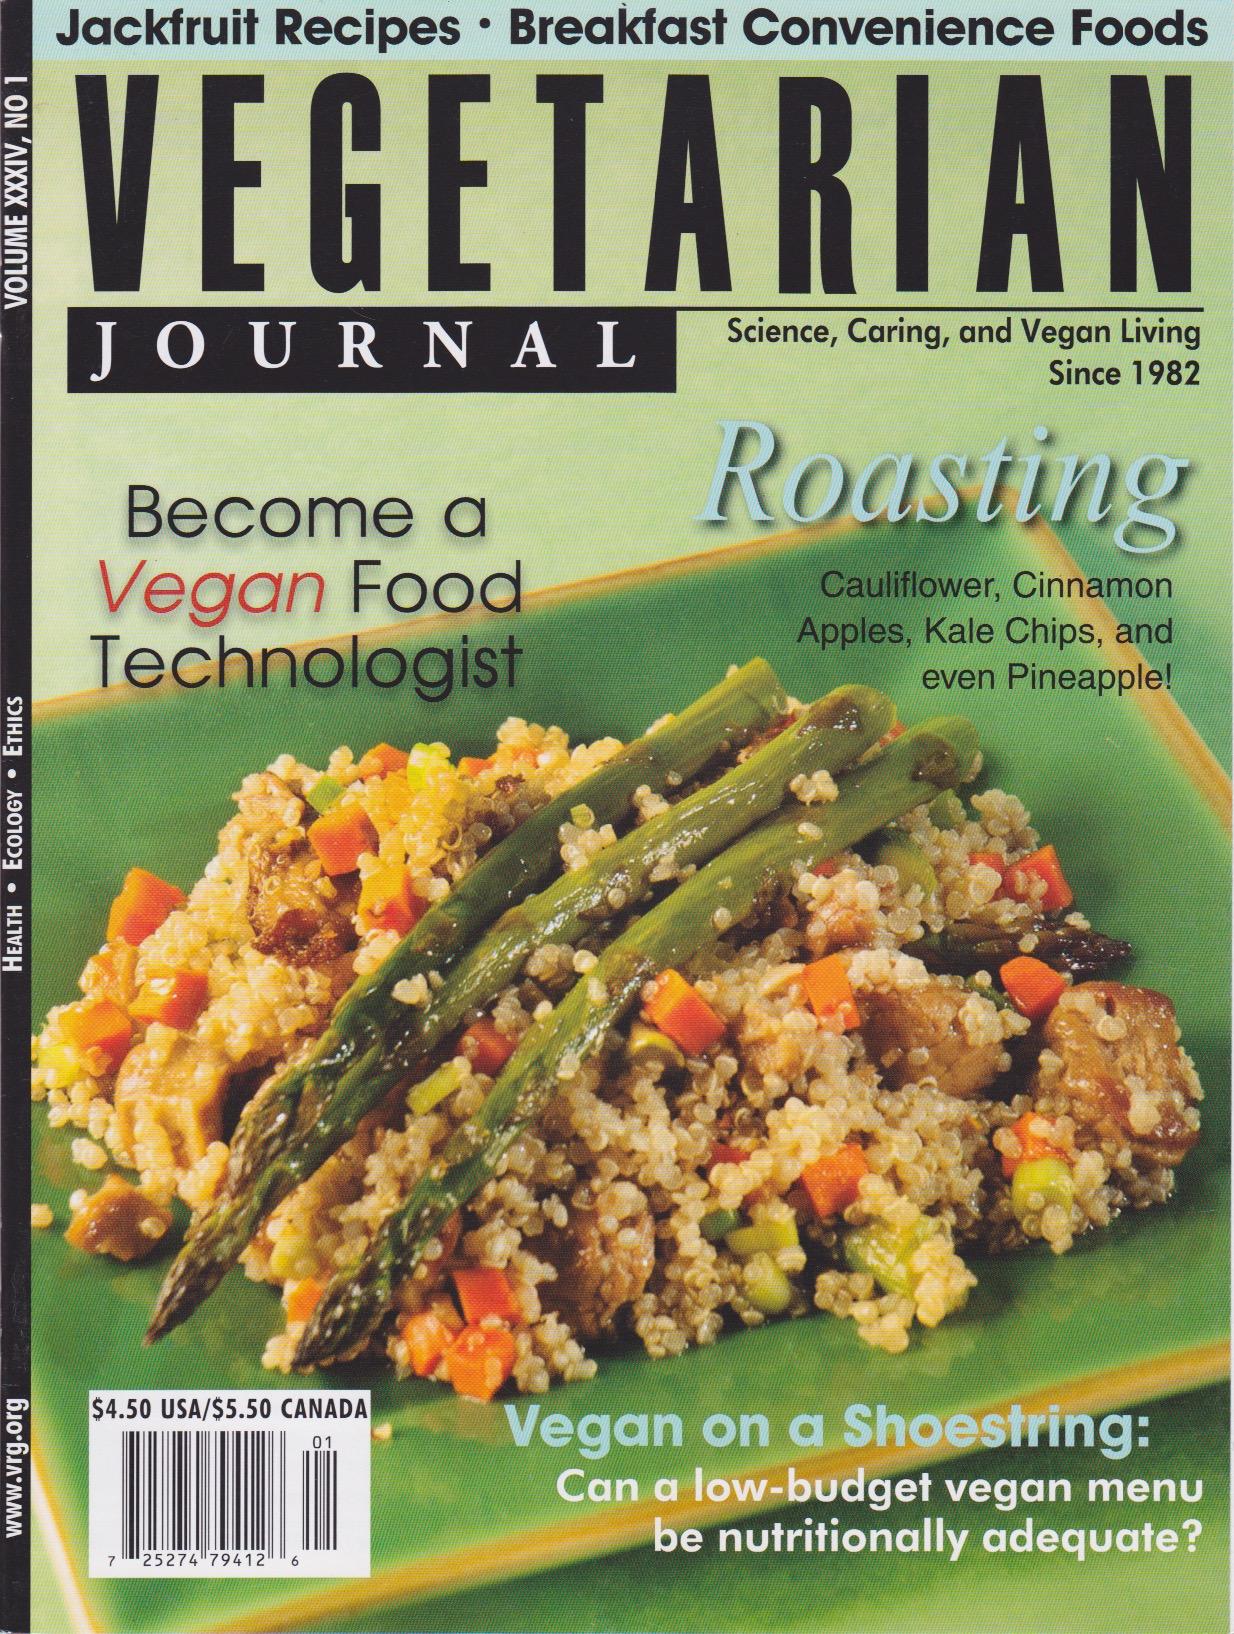 VEG_Journal cover.jpeg